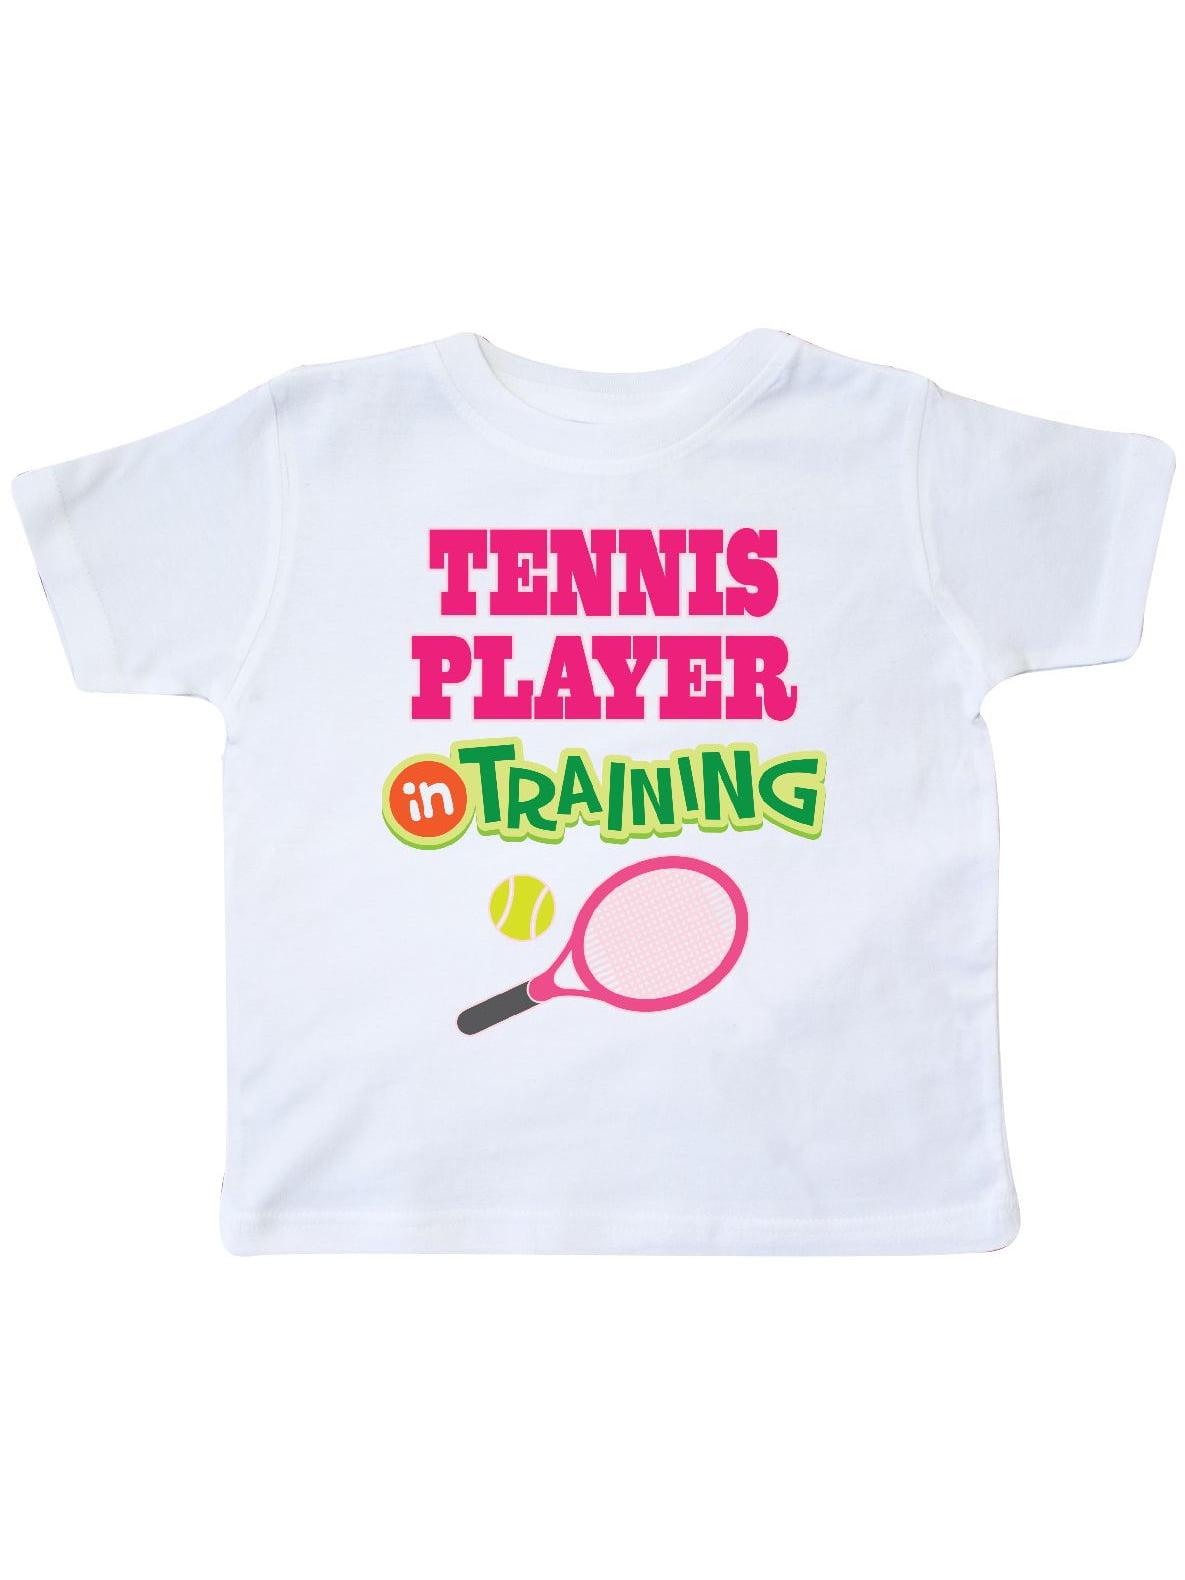 Future Tennis Player In Training Toddler T-Shirt